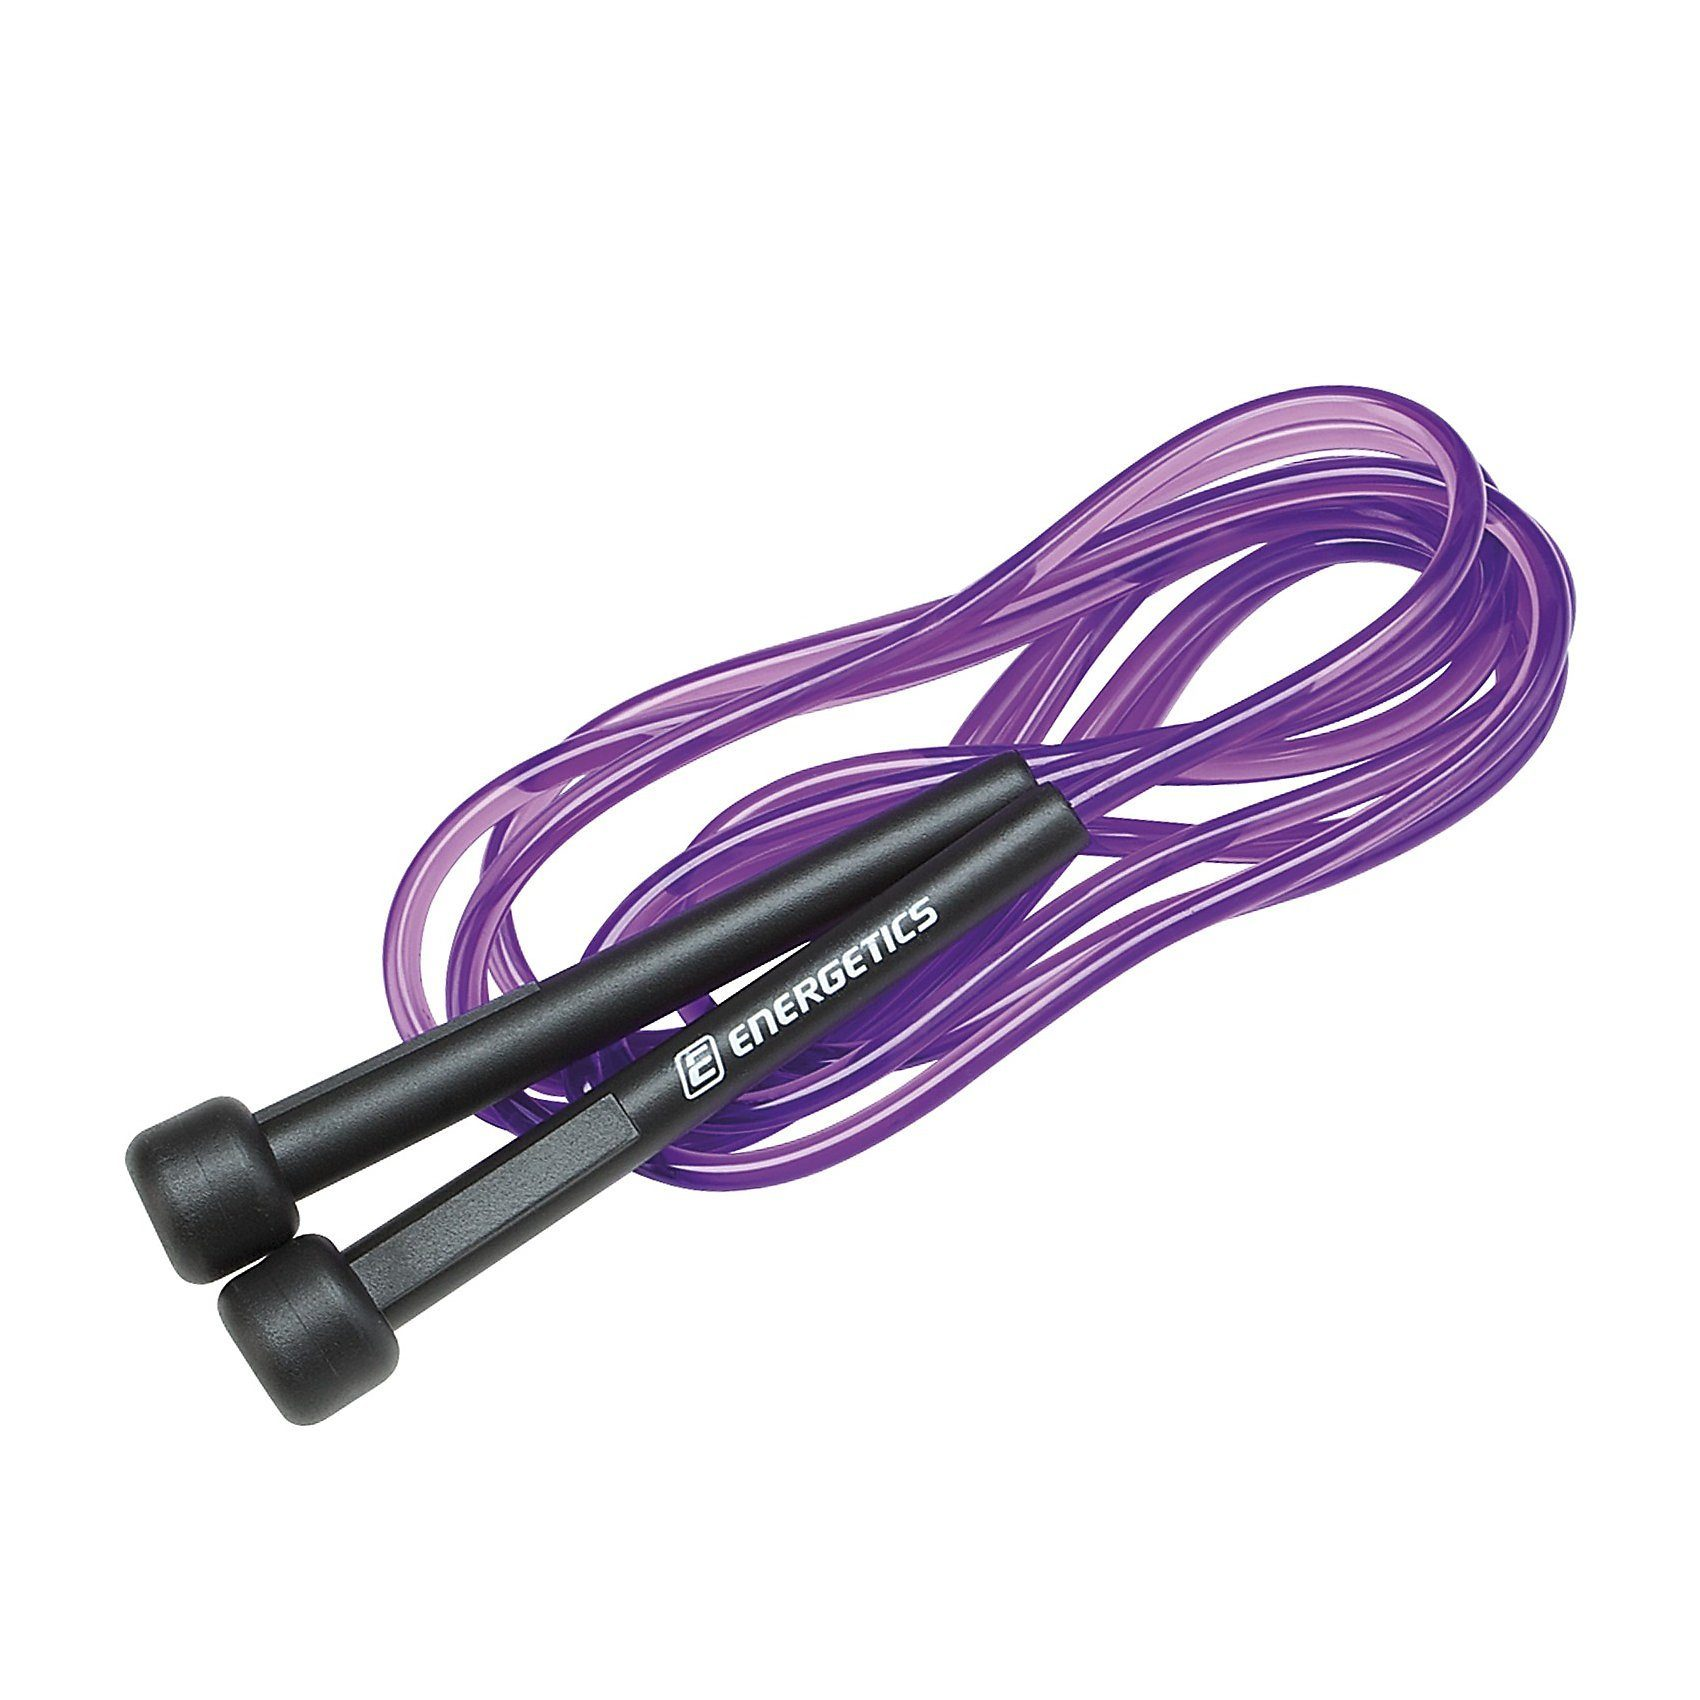 Energetics Springseil Skip Rope